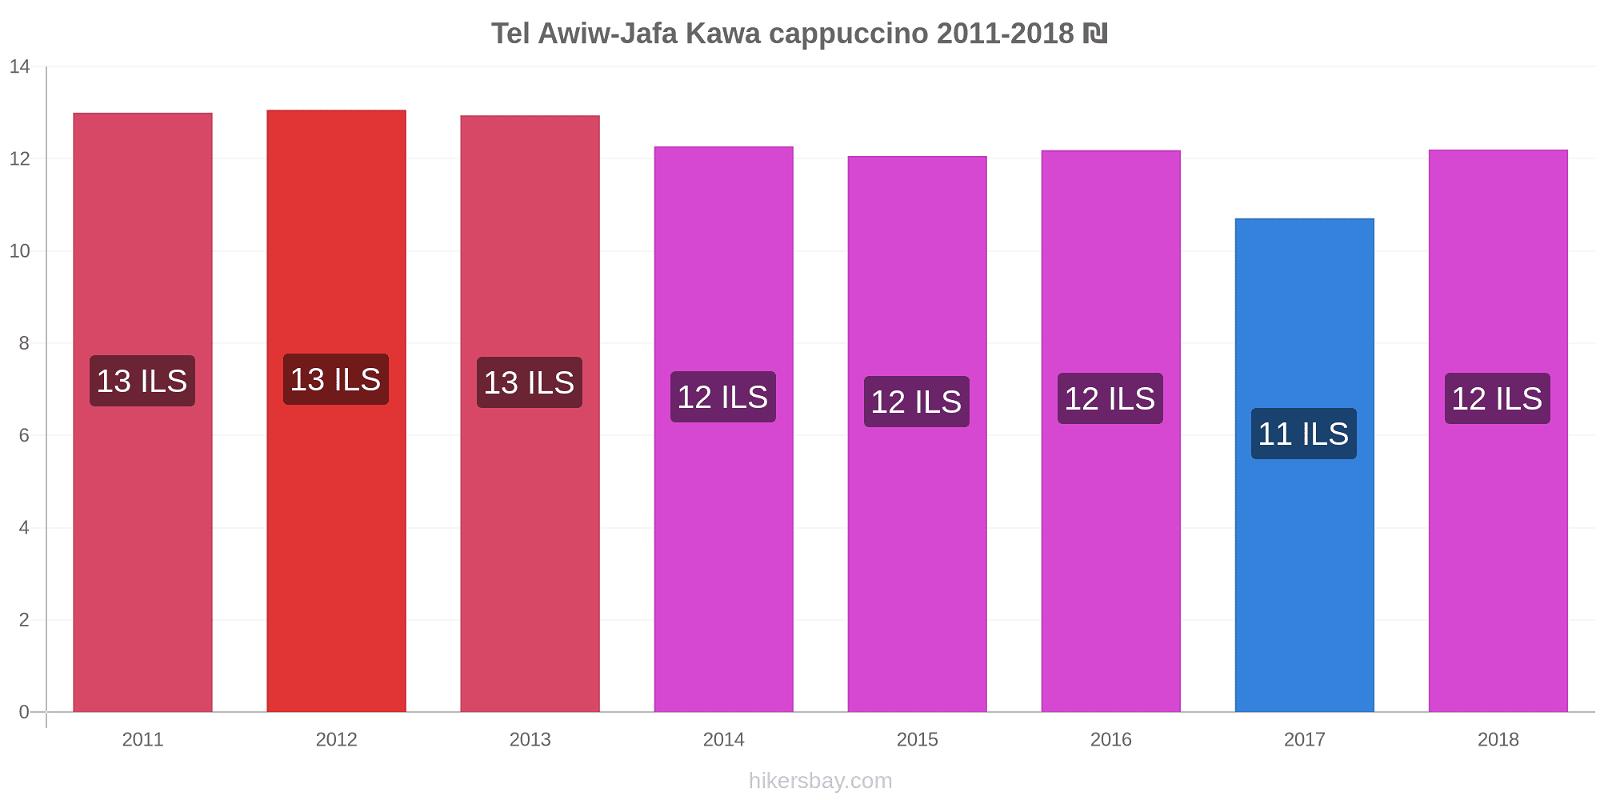 Tel Awiw-Jafa zmiany cen Kawa cappuccino hikersbay.com